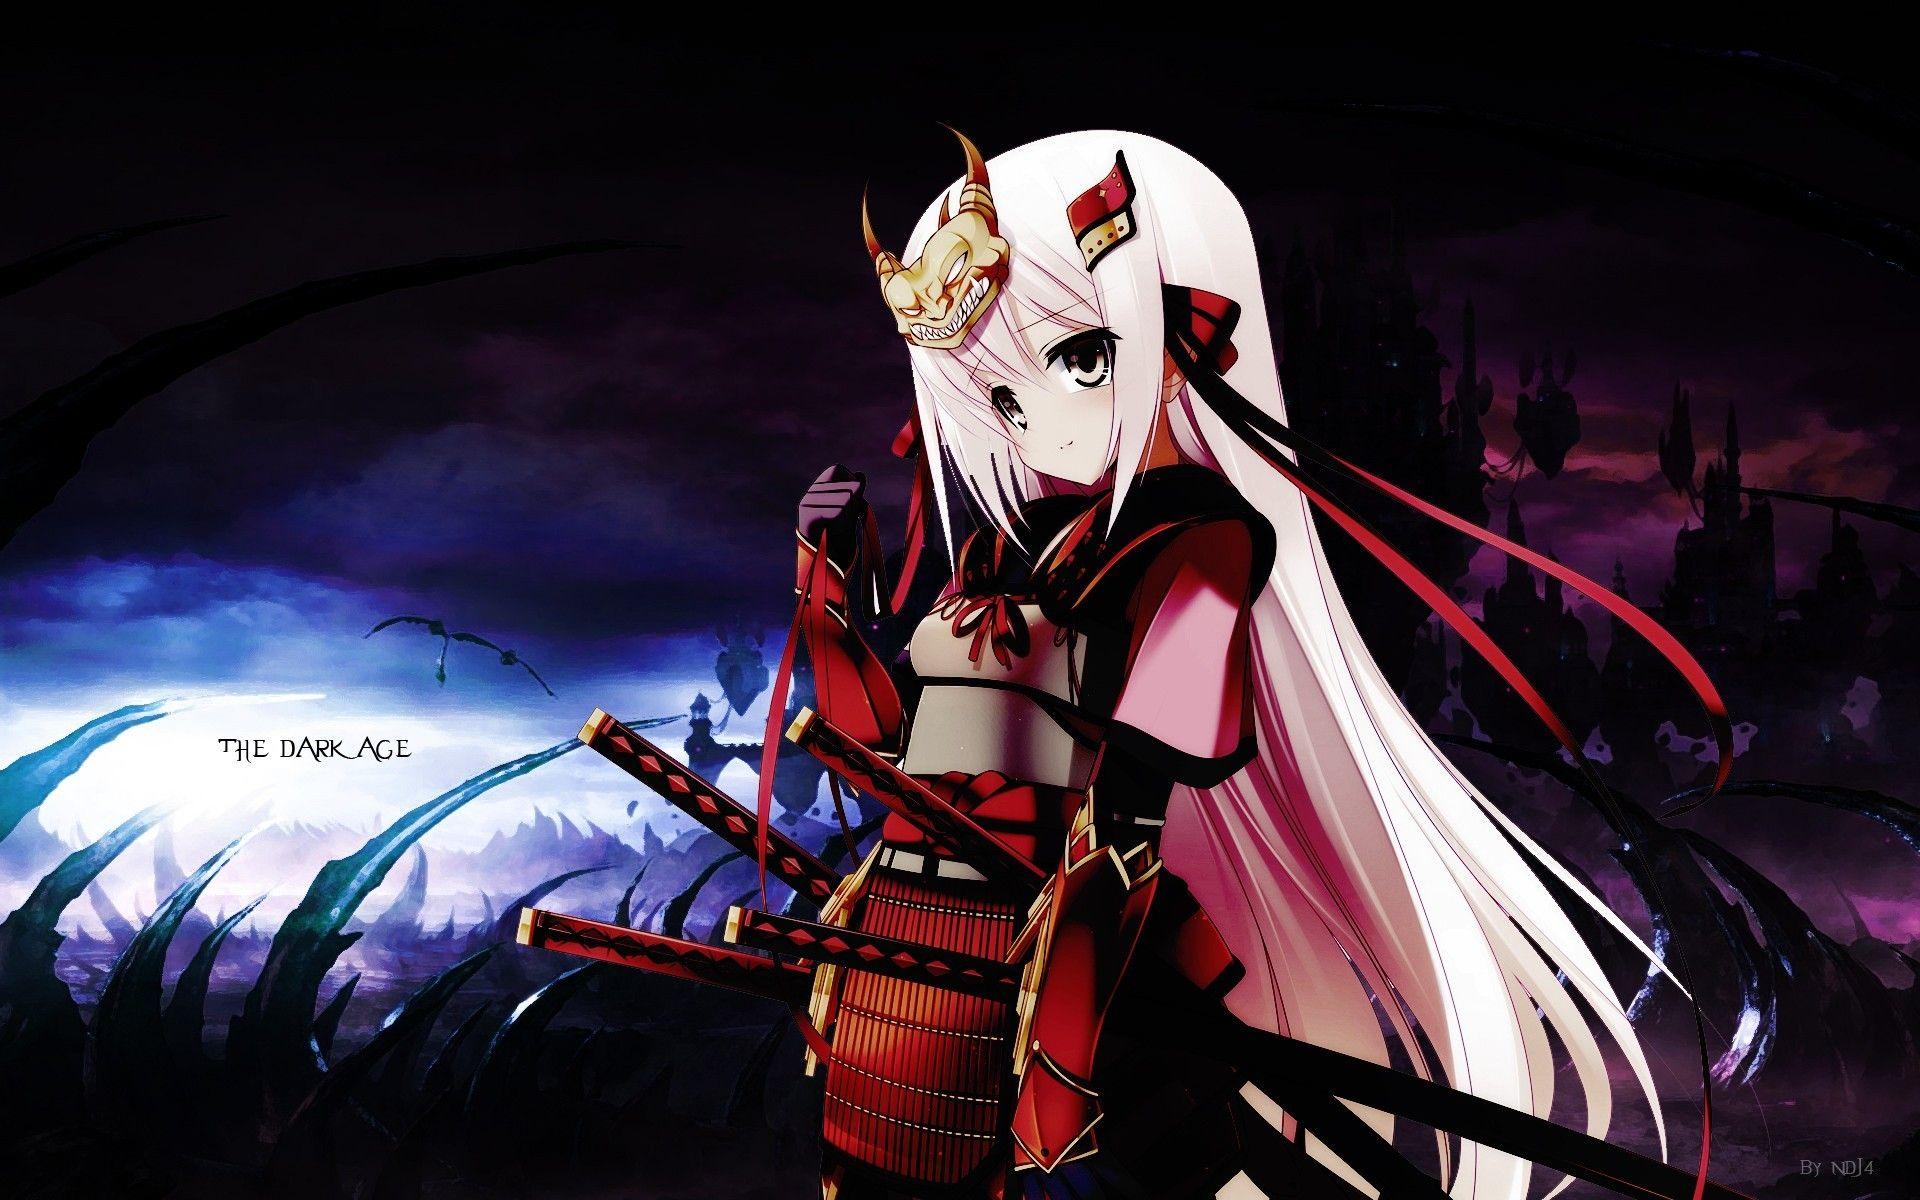 warrior neko girl wallpaper - photo #11